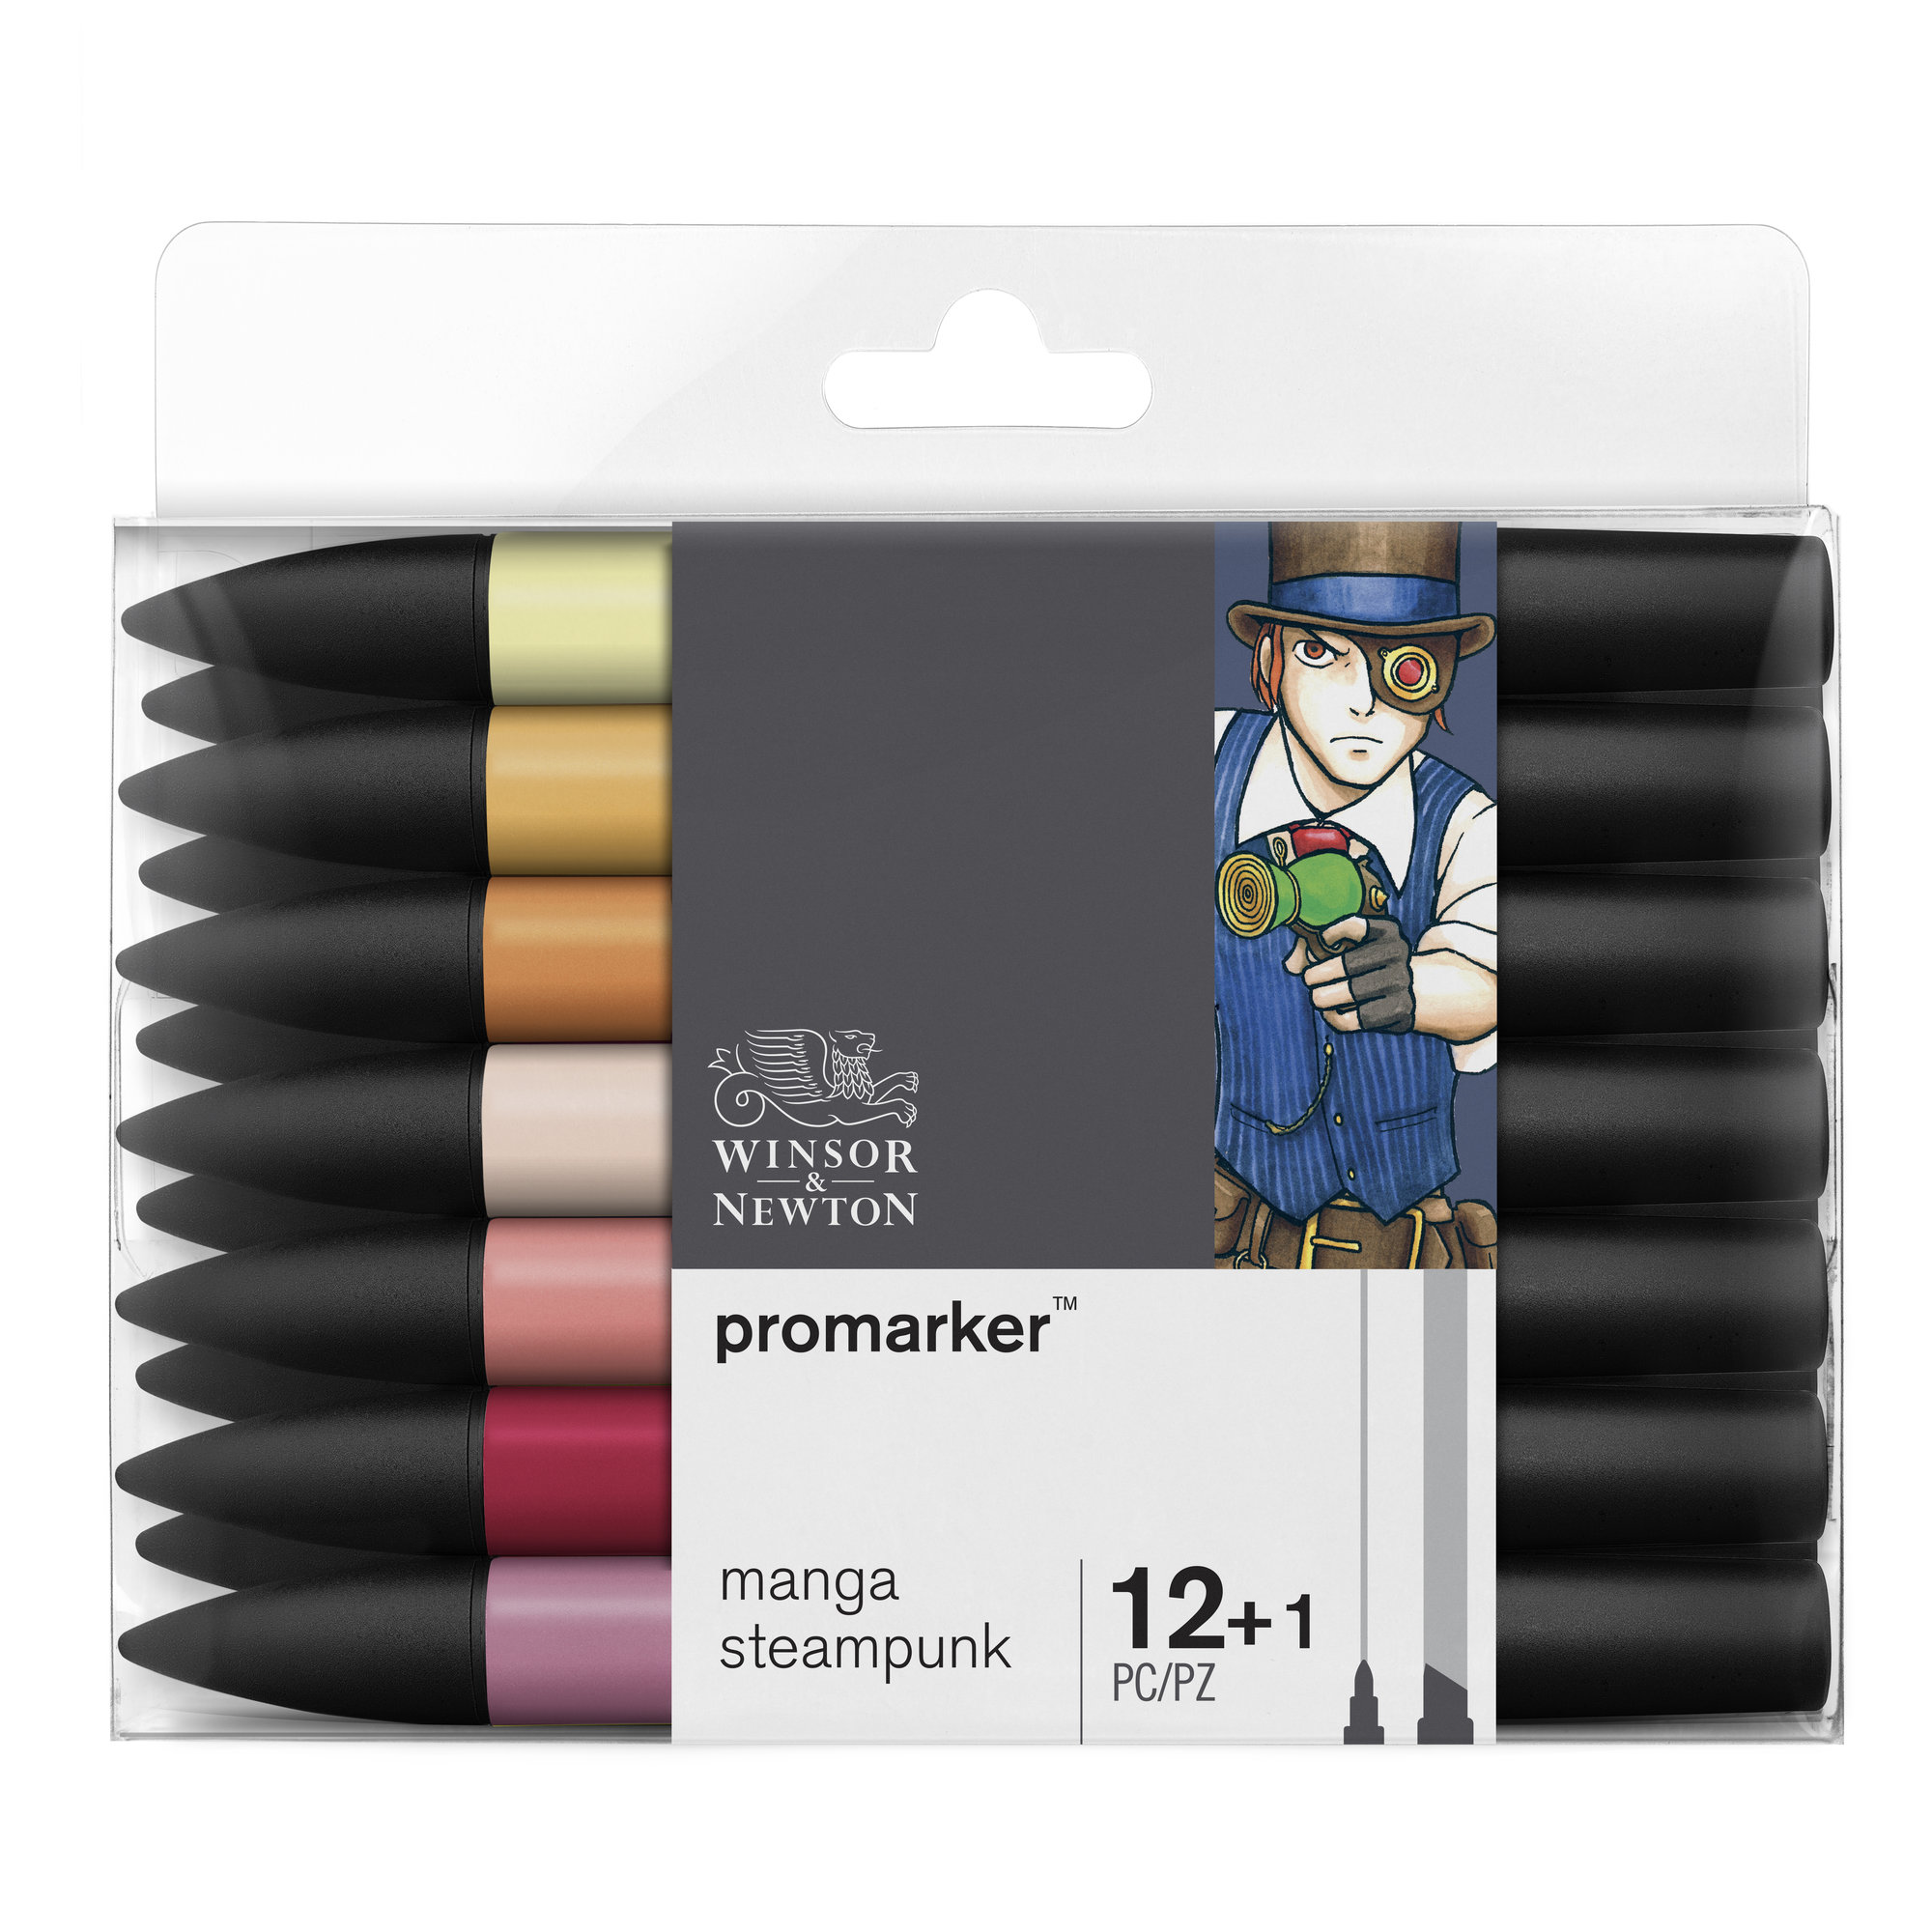 ProMarker - Pack de 13 marqueurs double pointe - manga steampunk